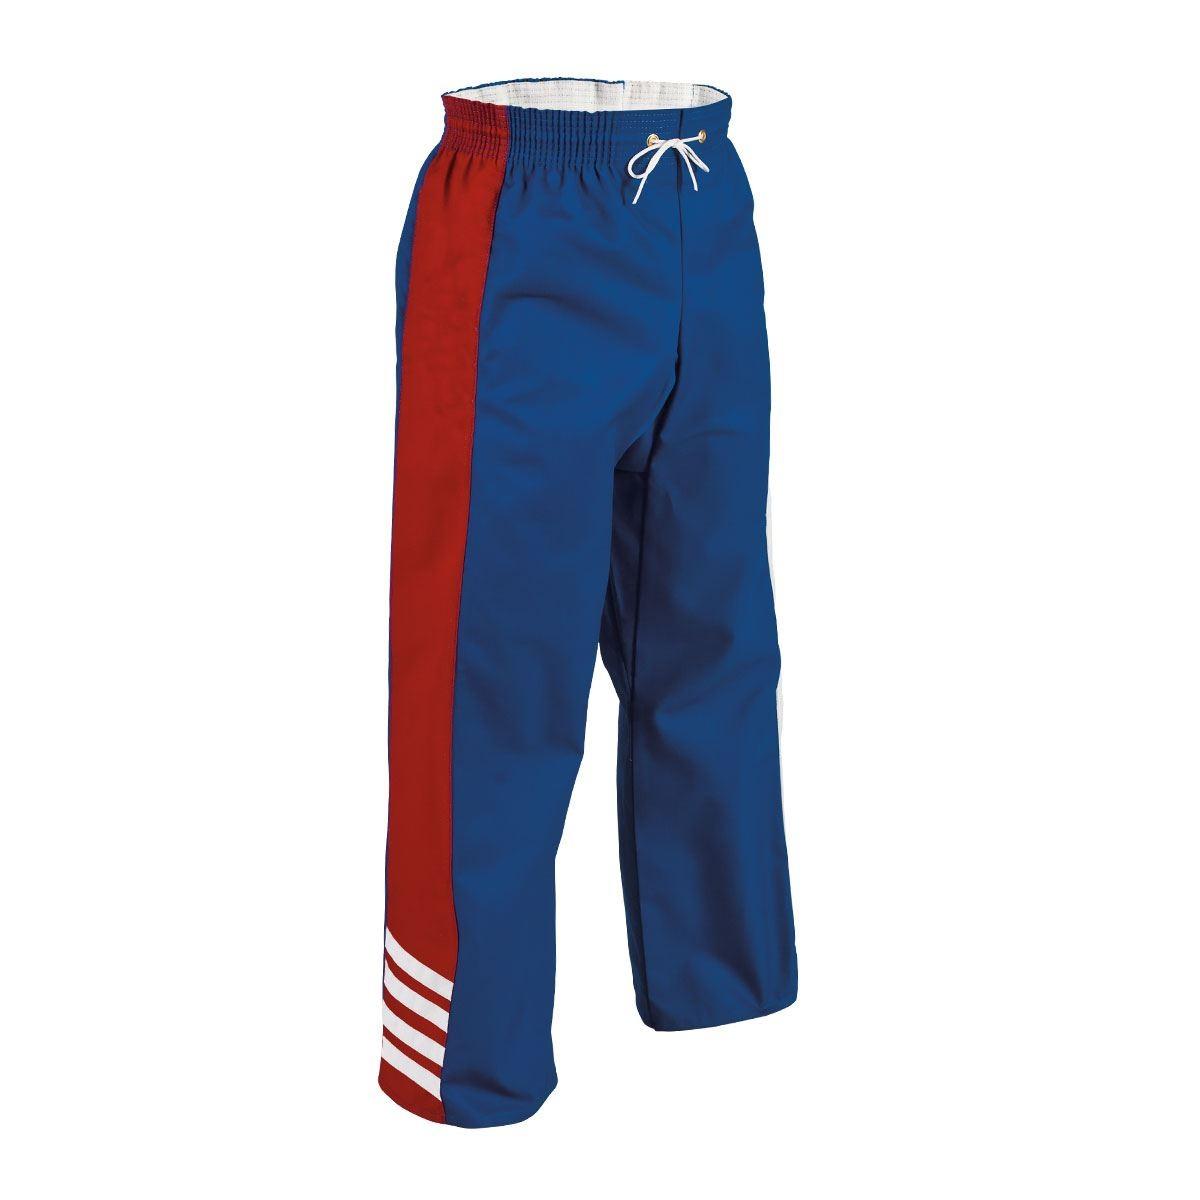 Stars and Stripes Martial Arts Karate Pants